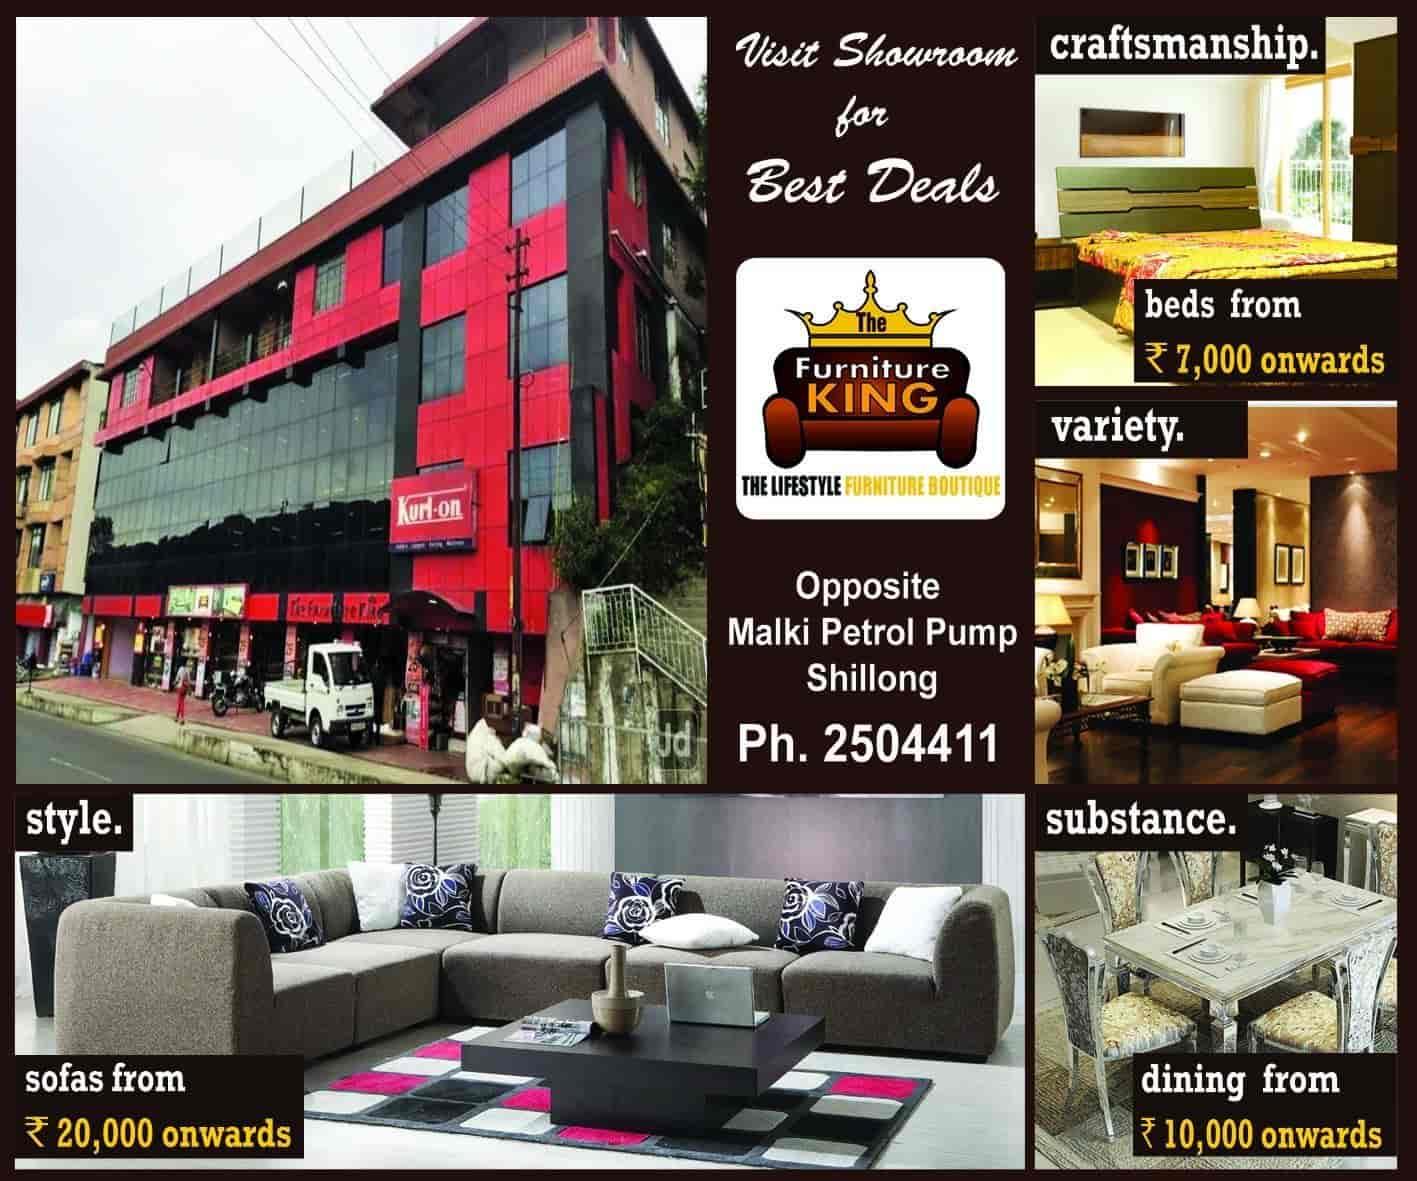 Shillong Kitchen Express